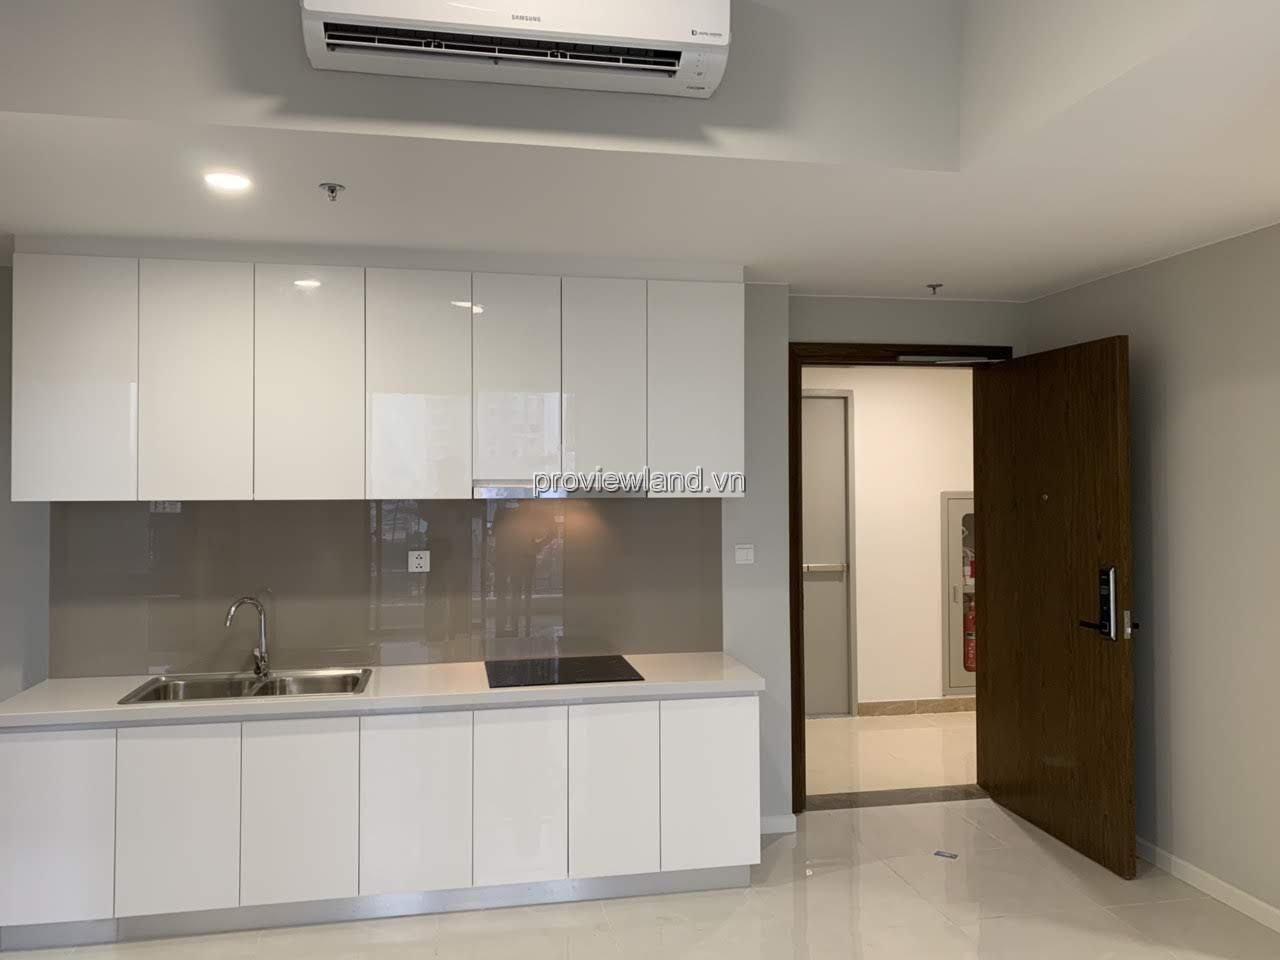 Apartment-for-rent-Masteri-An-Phu-0007